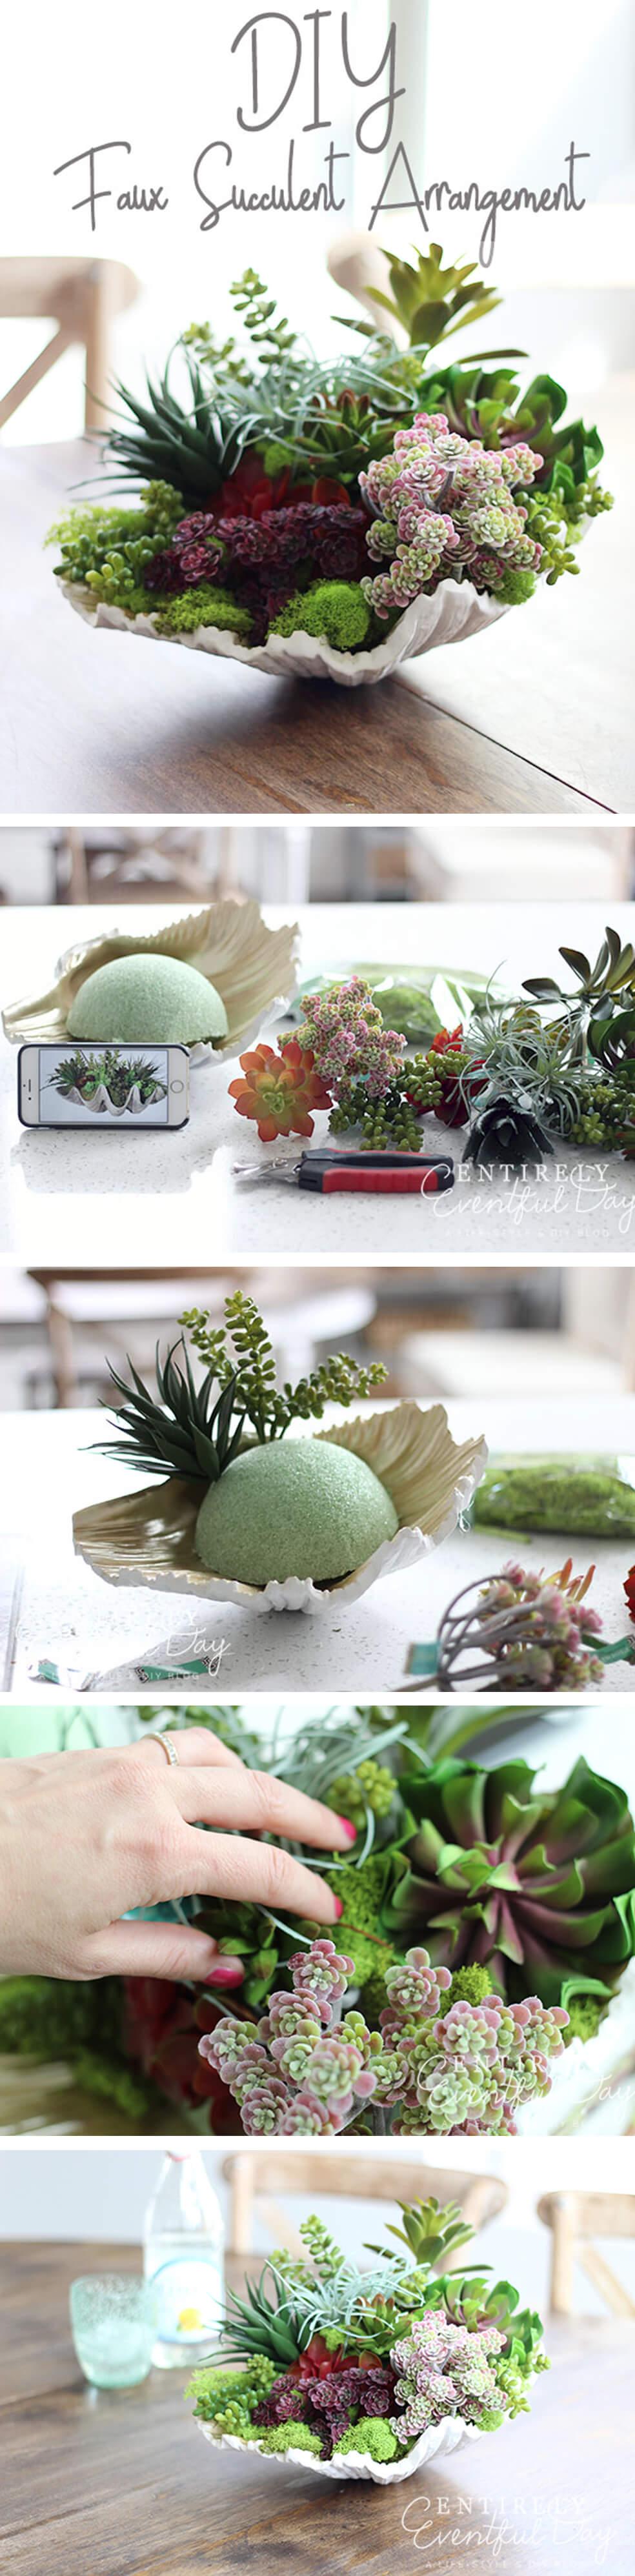 A Small Succulent Arrangement in a Seashell